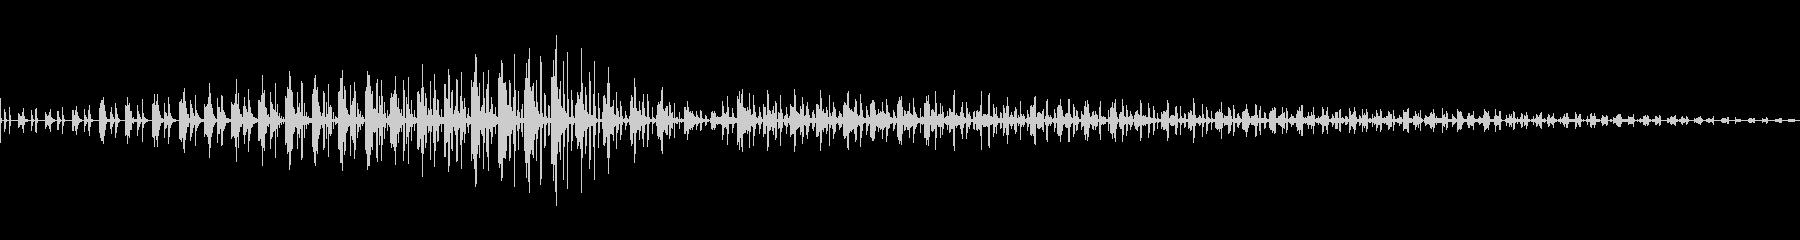 SF的機械音の未再生の波形